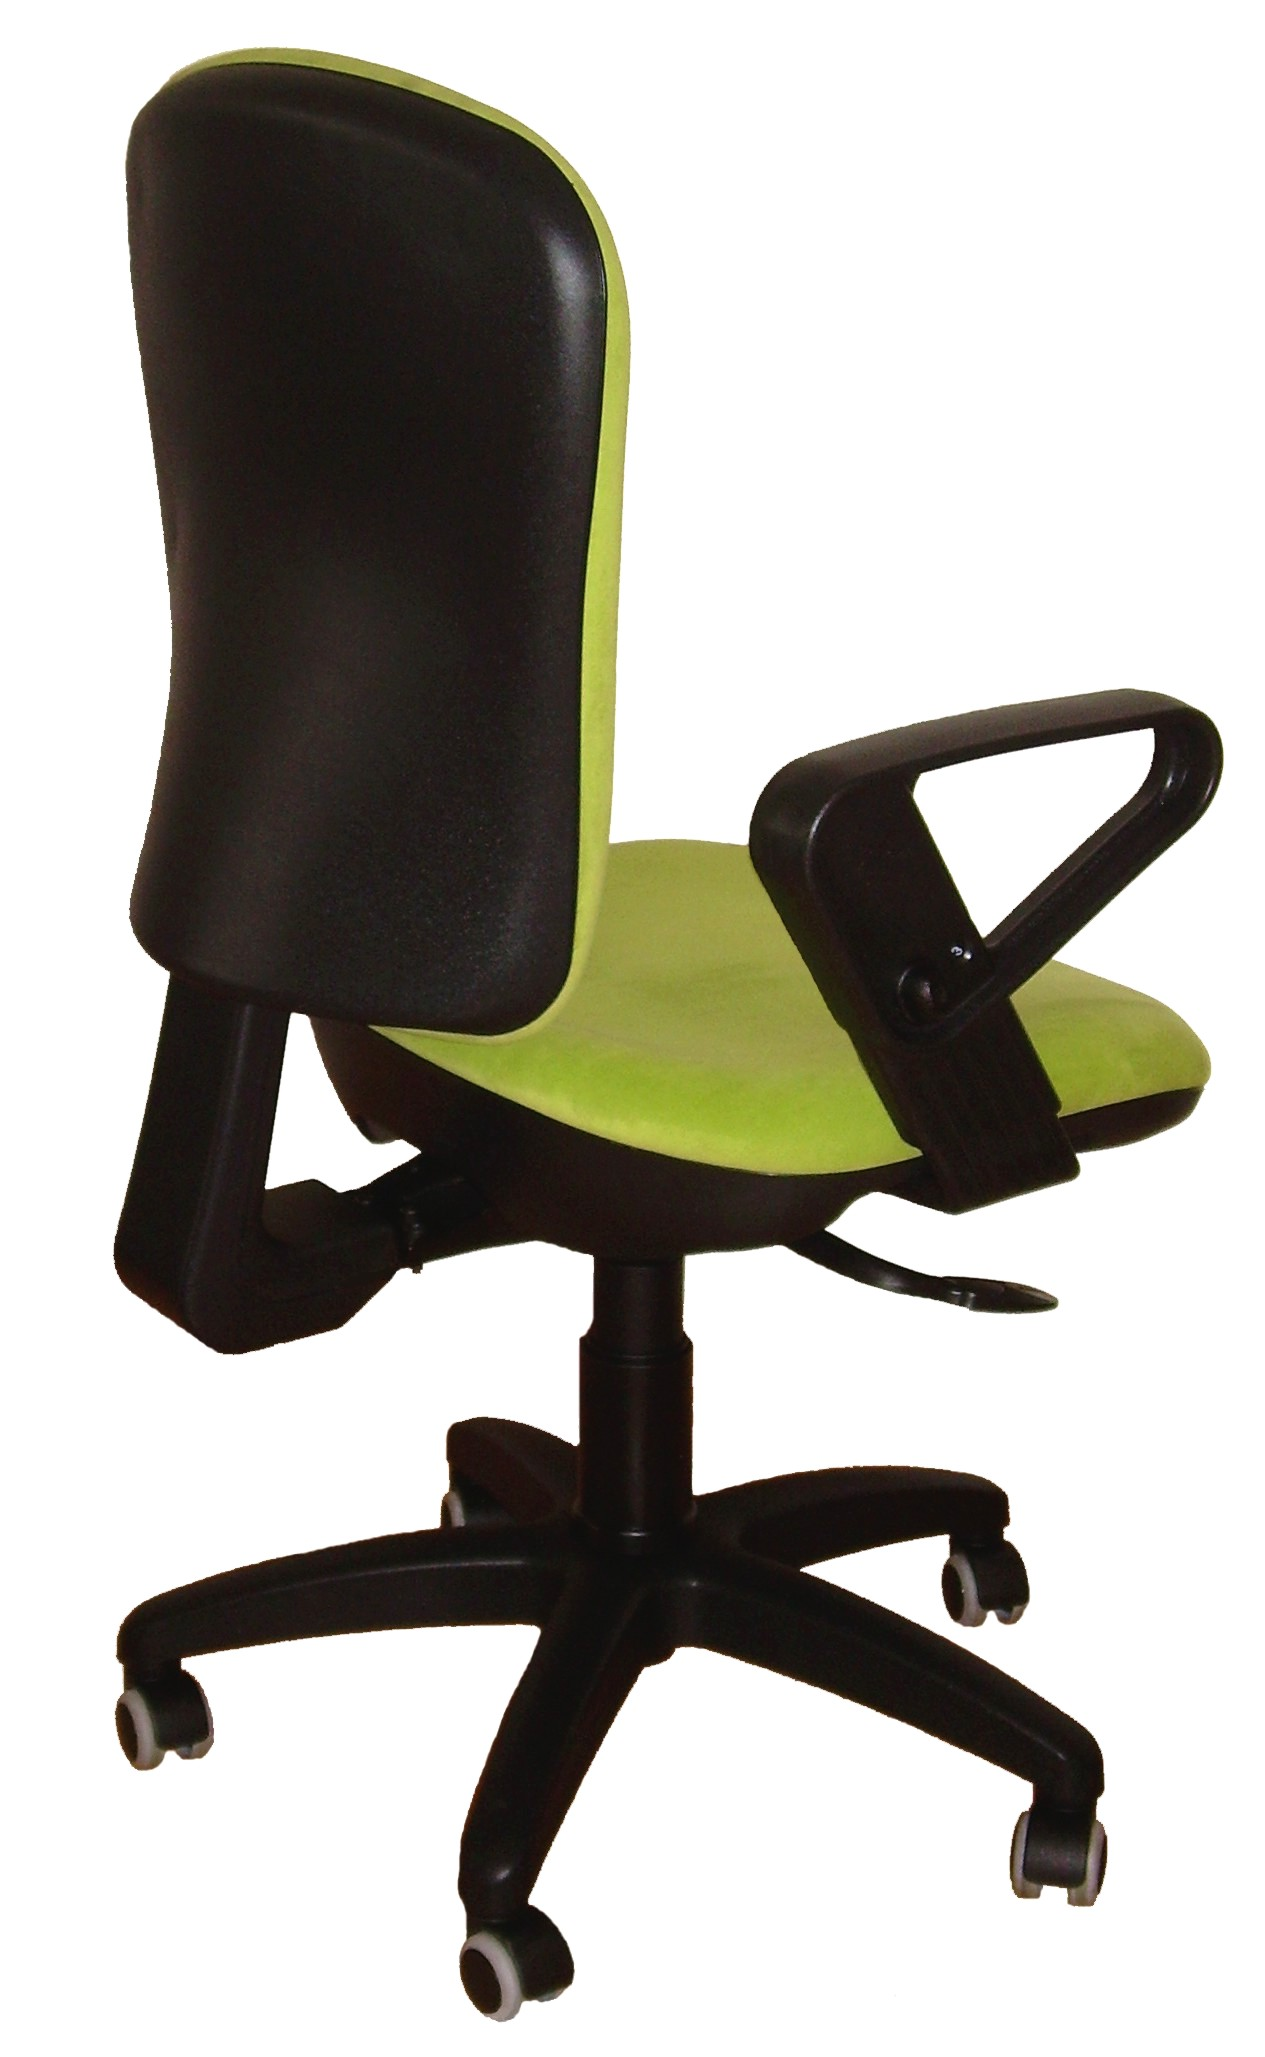 Silla ergon mica espaldar graduable asientos tapizables for Silla giratoria ergonomica